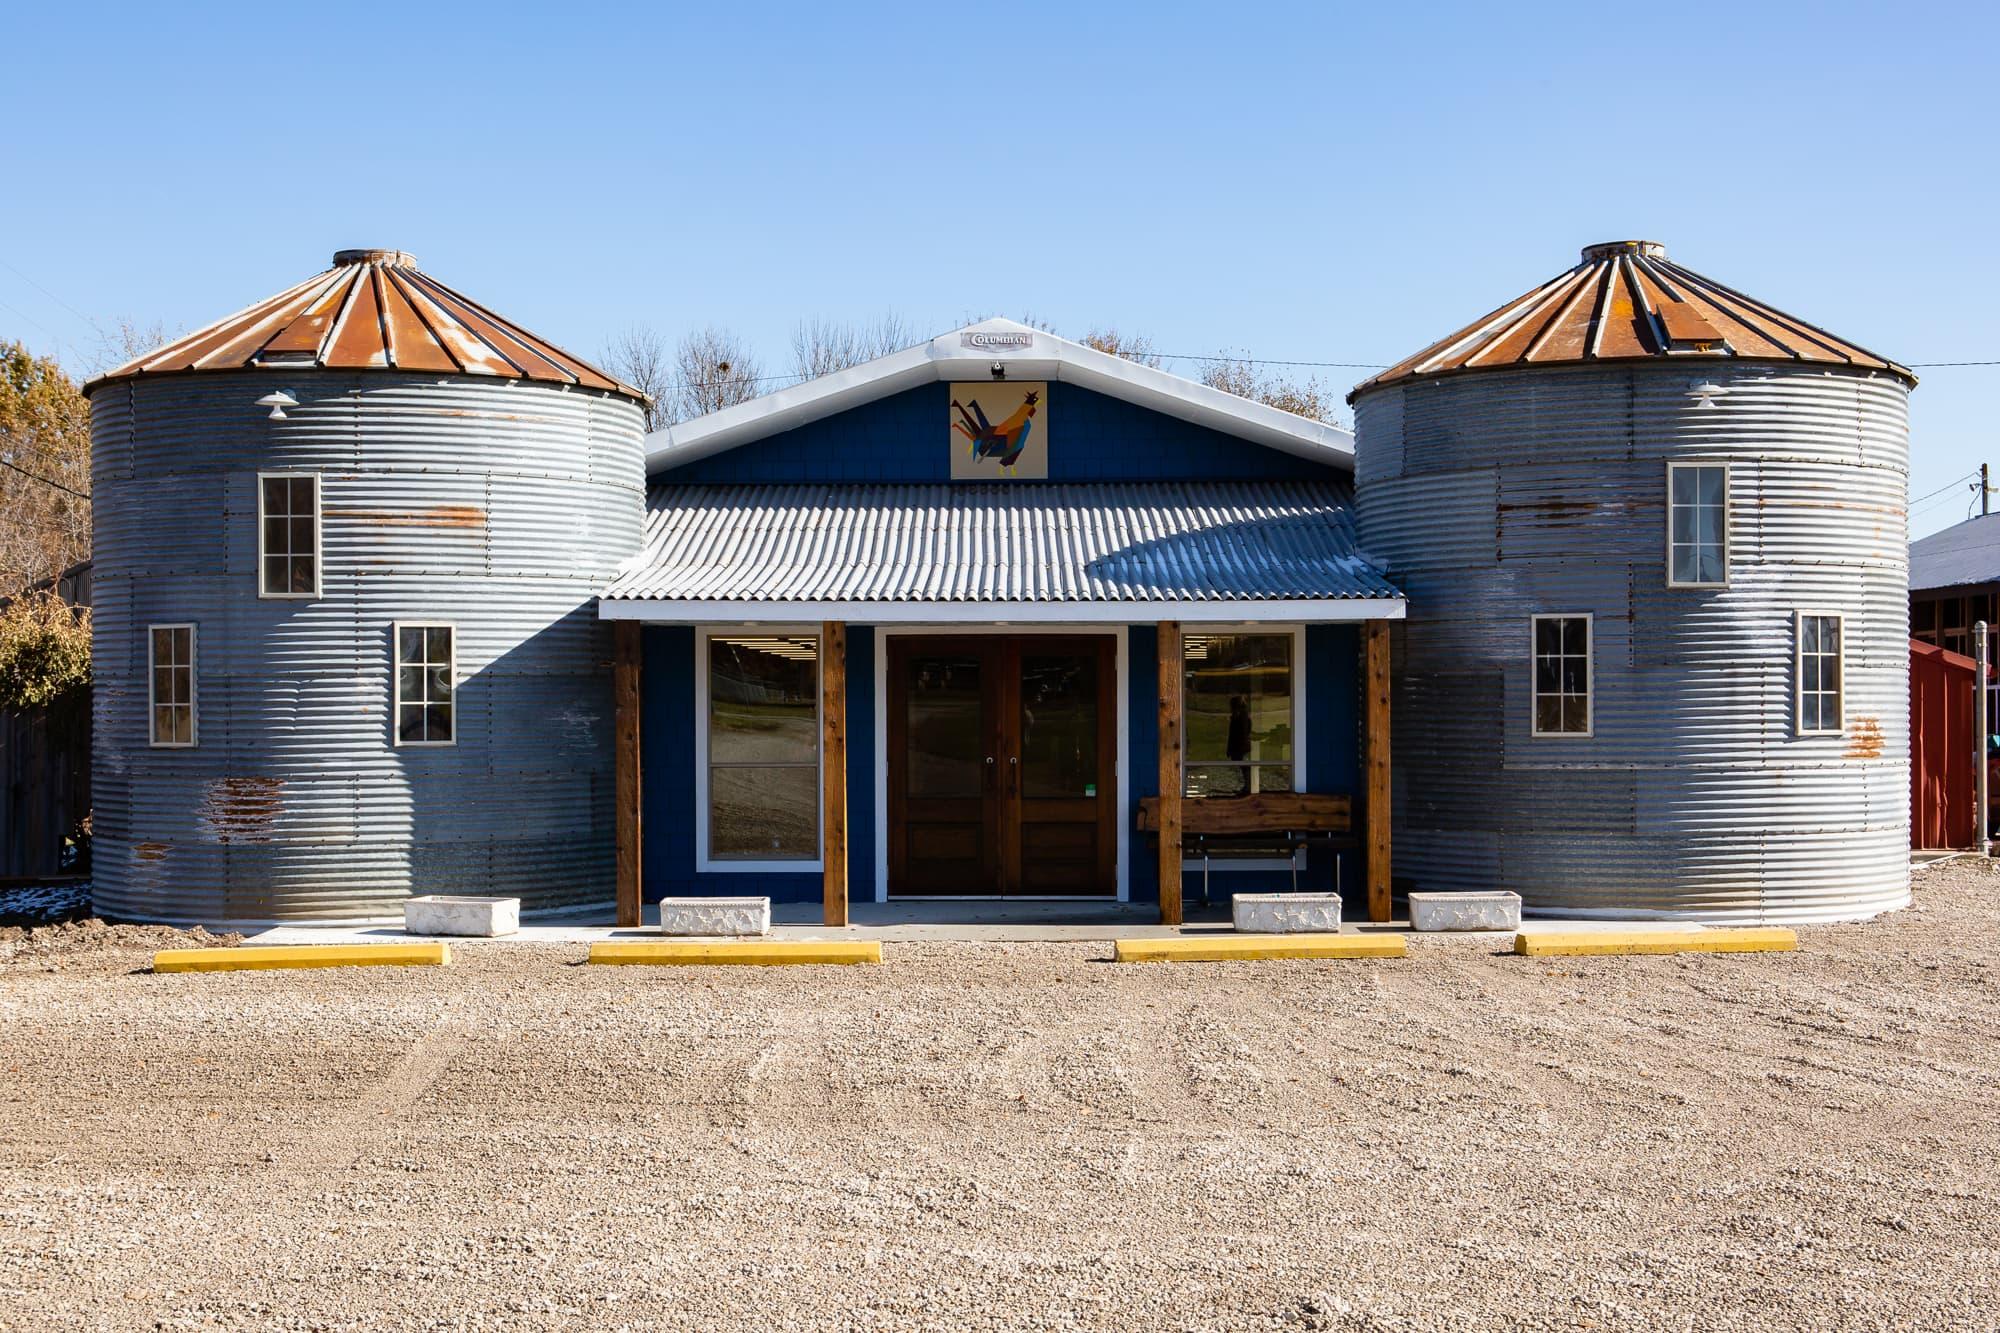 Grain Bins Turned into a Handmade DIY Home Tour | Apartment